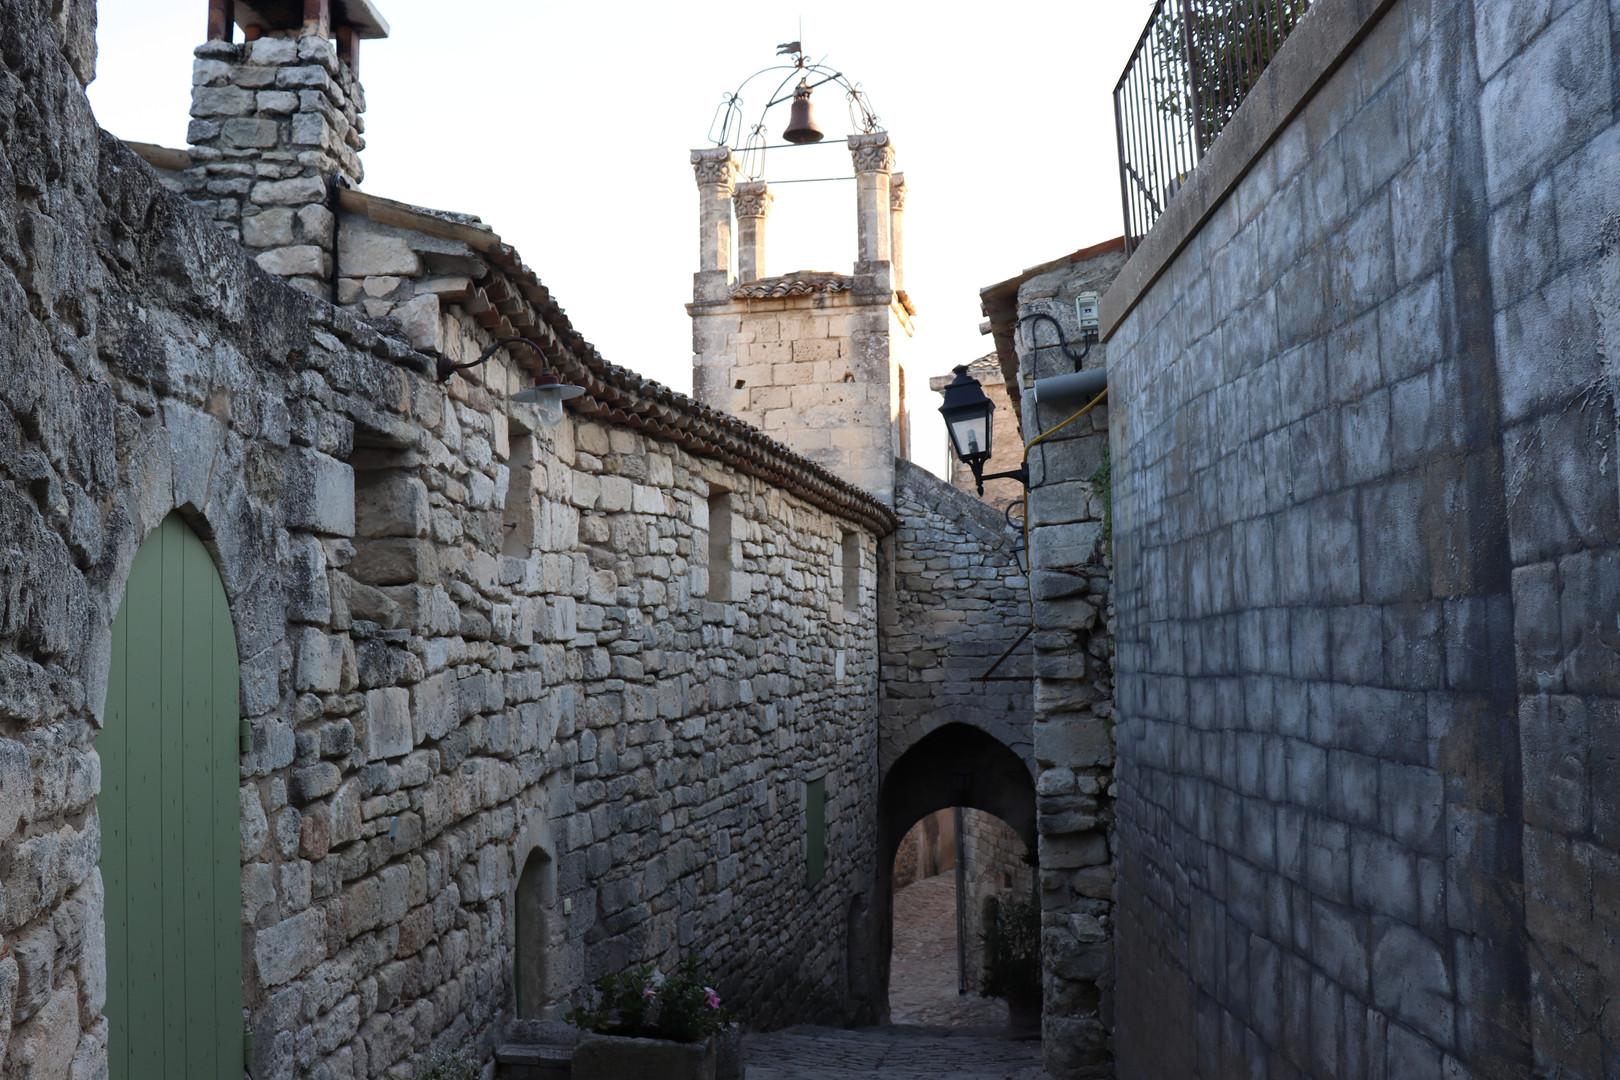 Lower Belltower Photo